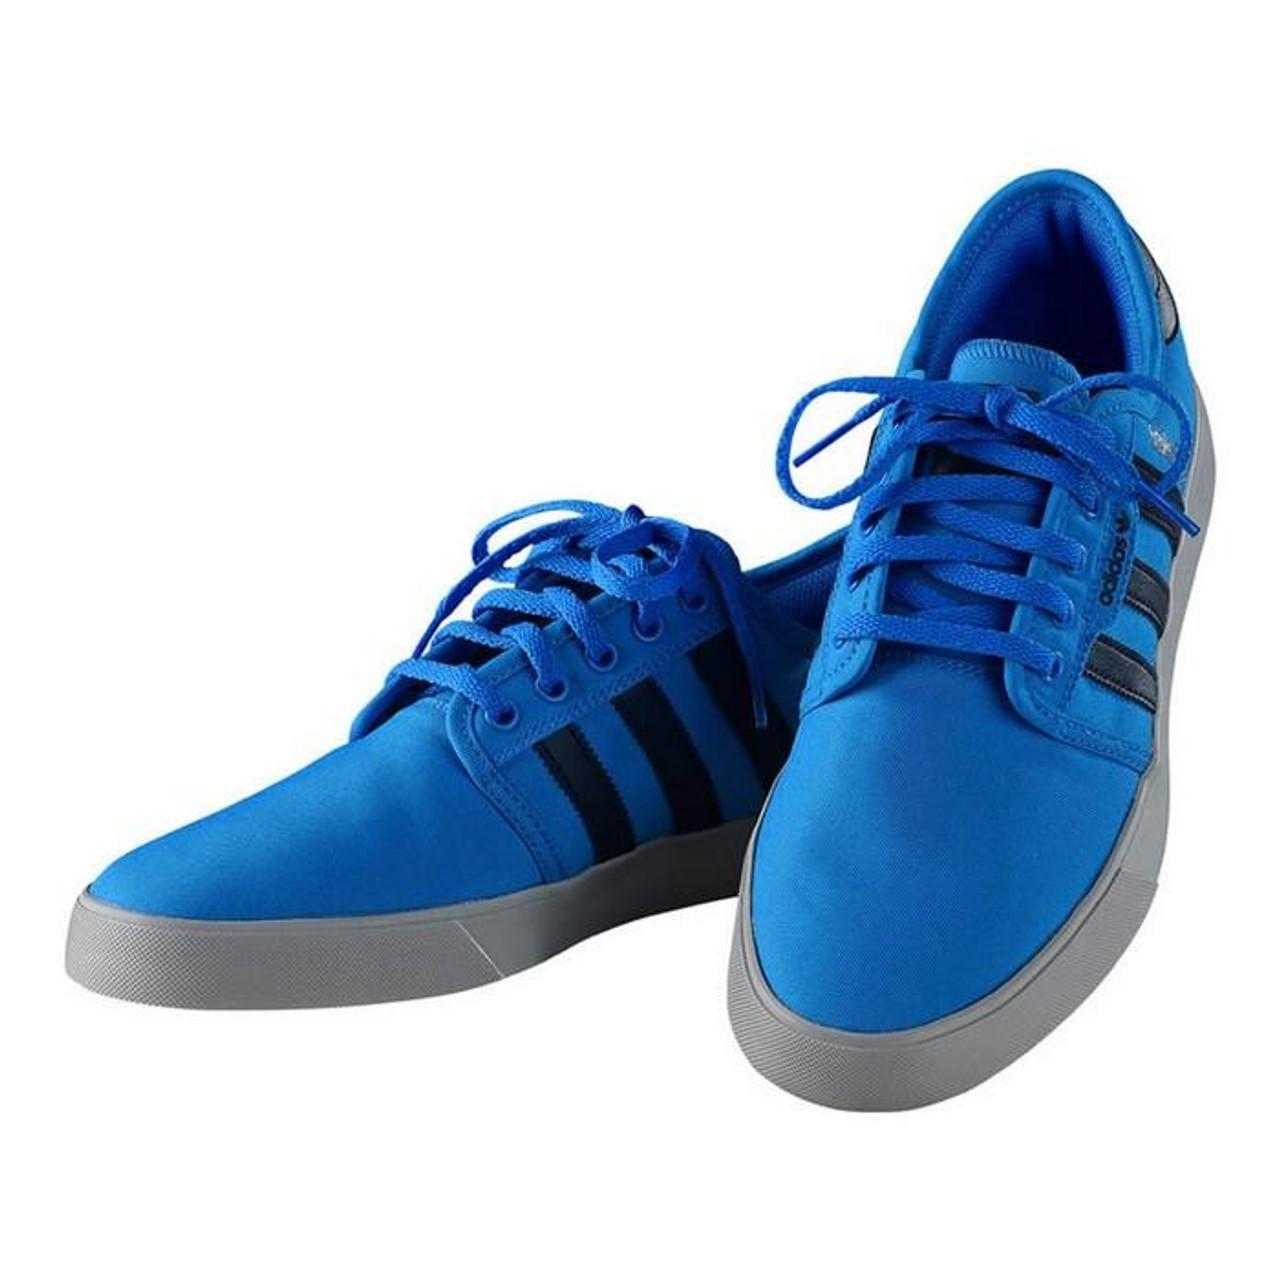 Troy Lee Designs TLD Adidas Seeley Team Shoes Cyan